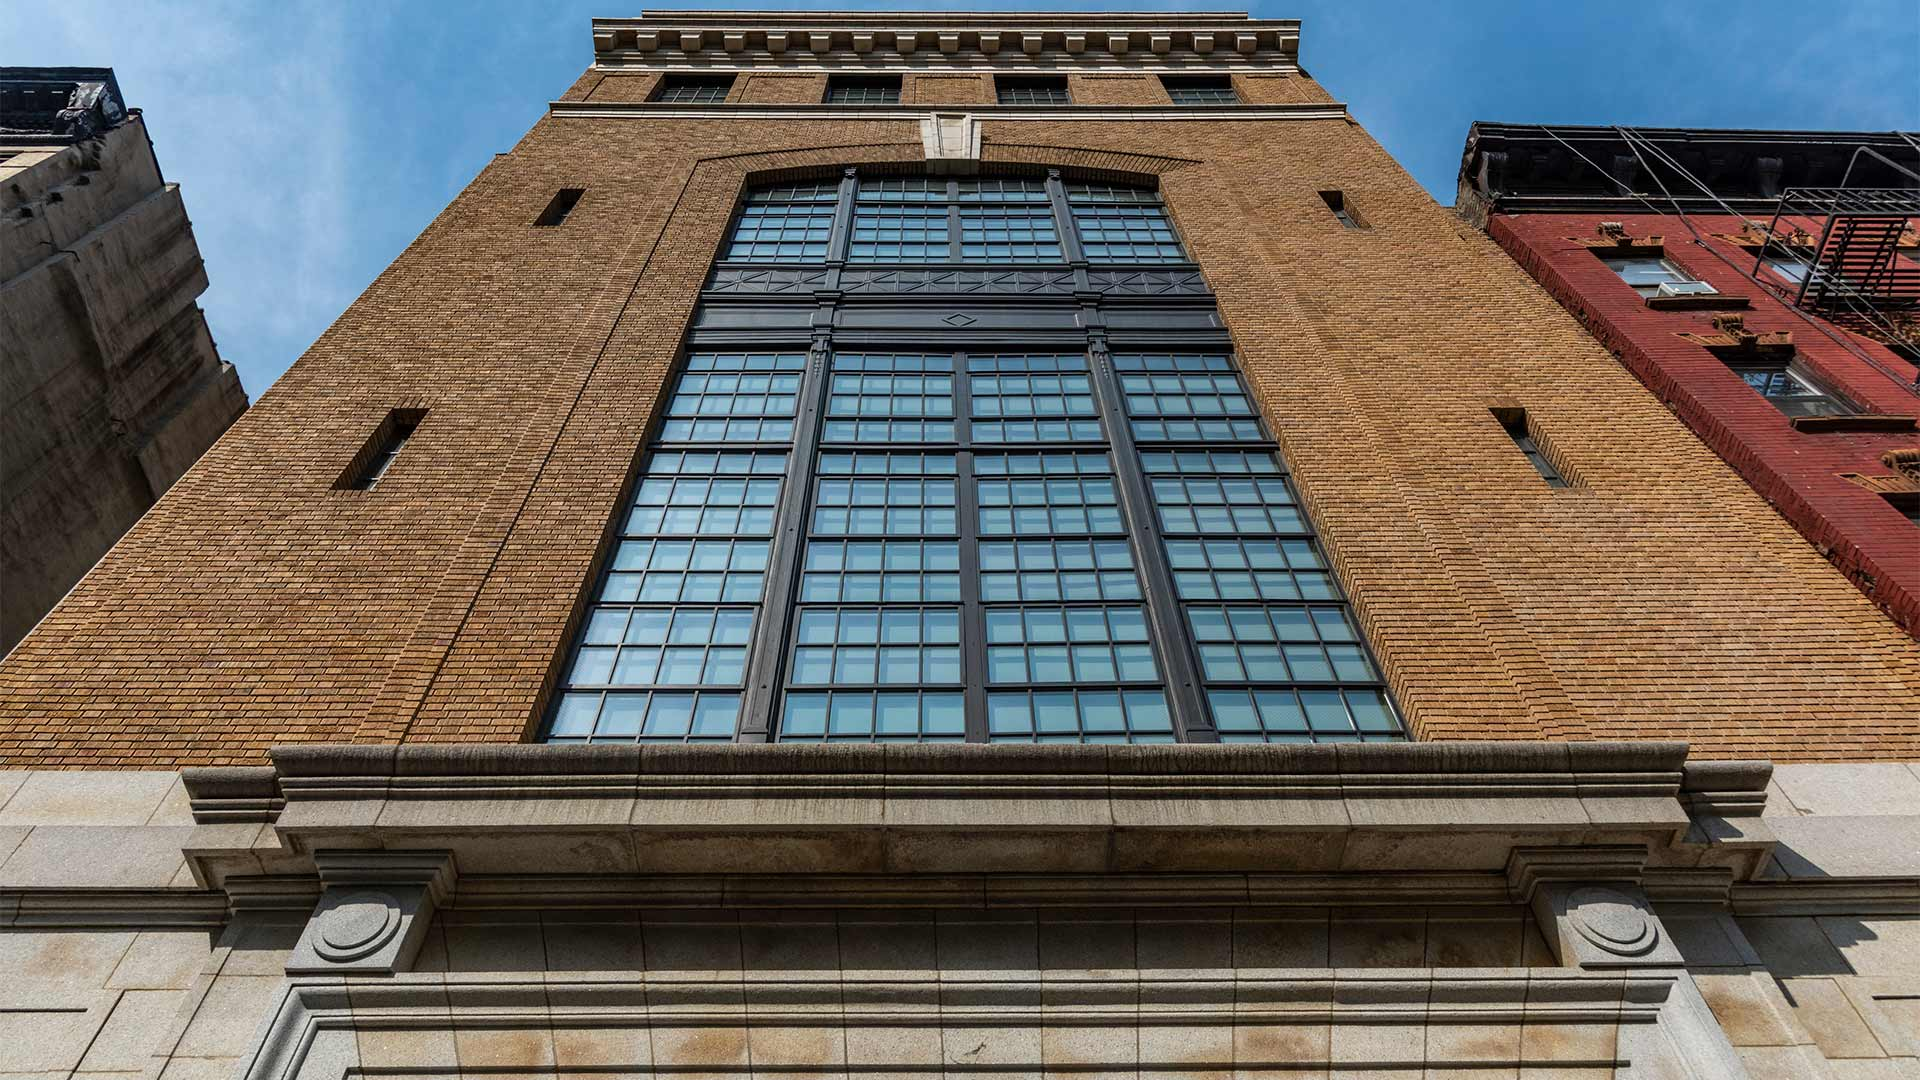 Big steel glazed windows outdoors